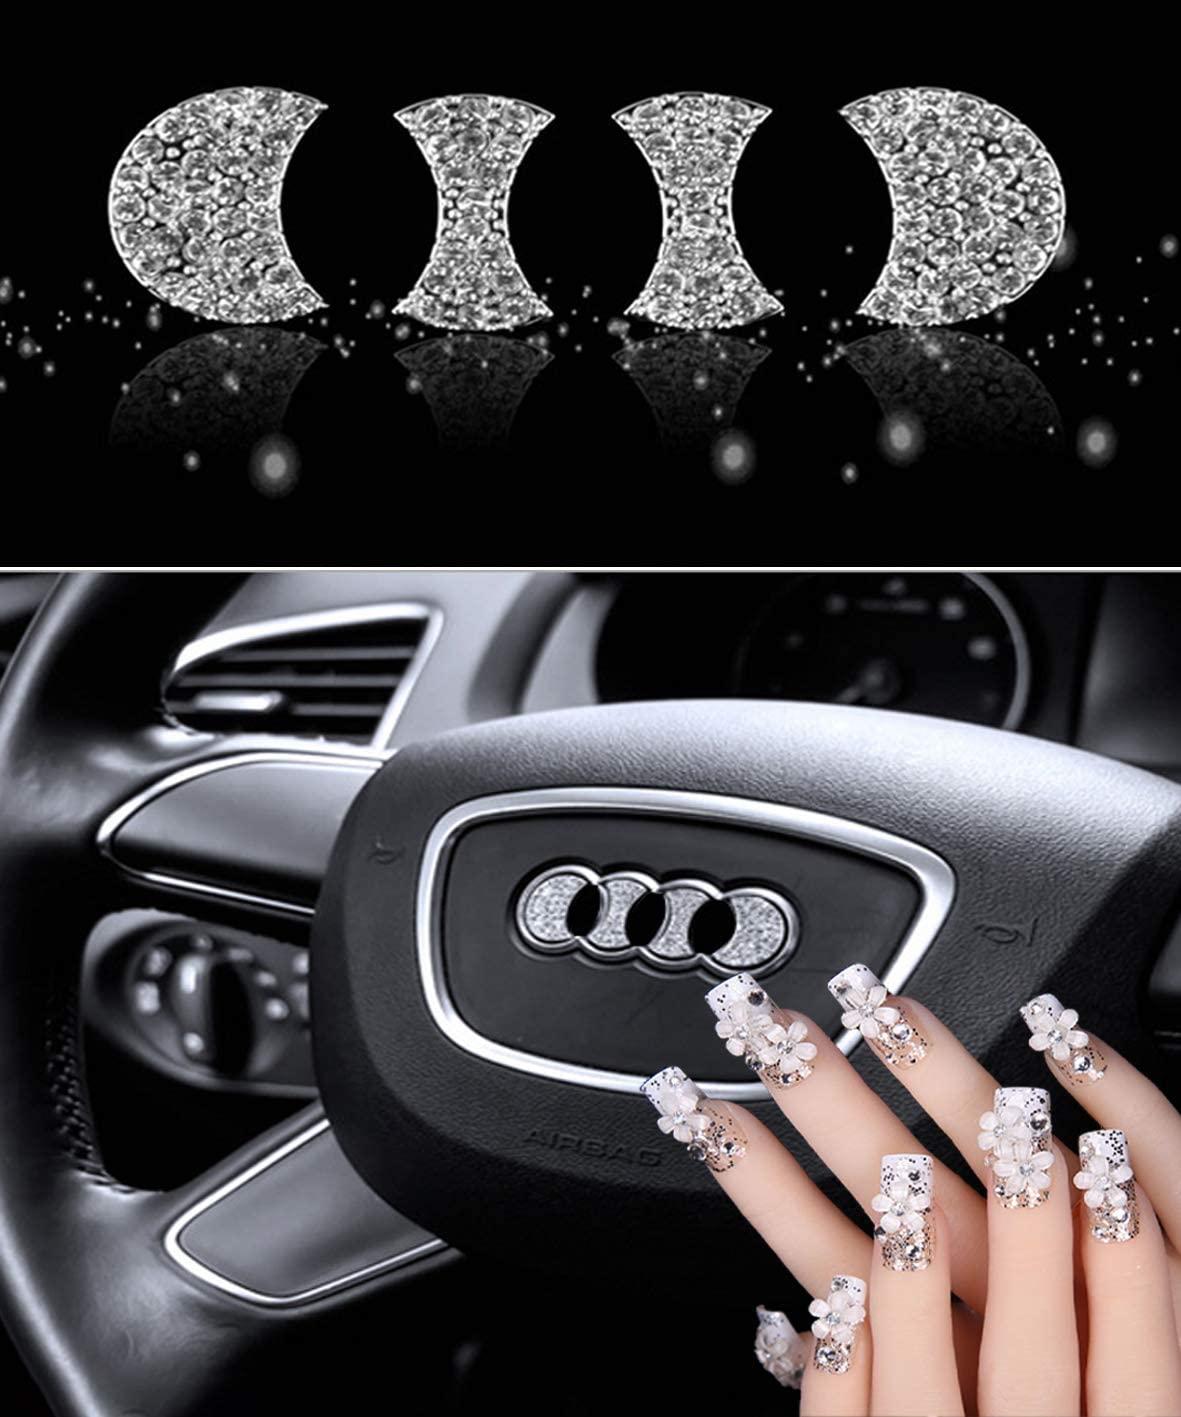 Sparkle-um Steering Wheel Unique Bling Crystal Badge Emblem Overlay Decal Decoration Cover Sticker Trim for Audi.(Audi)